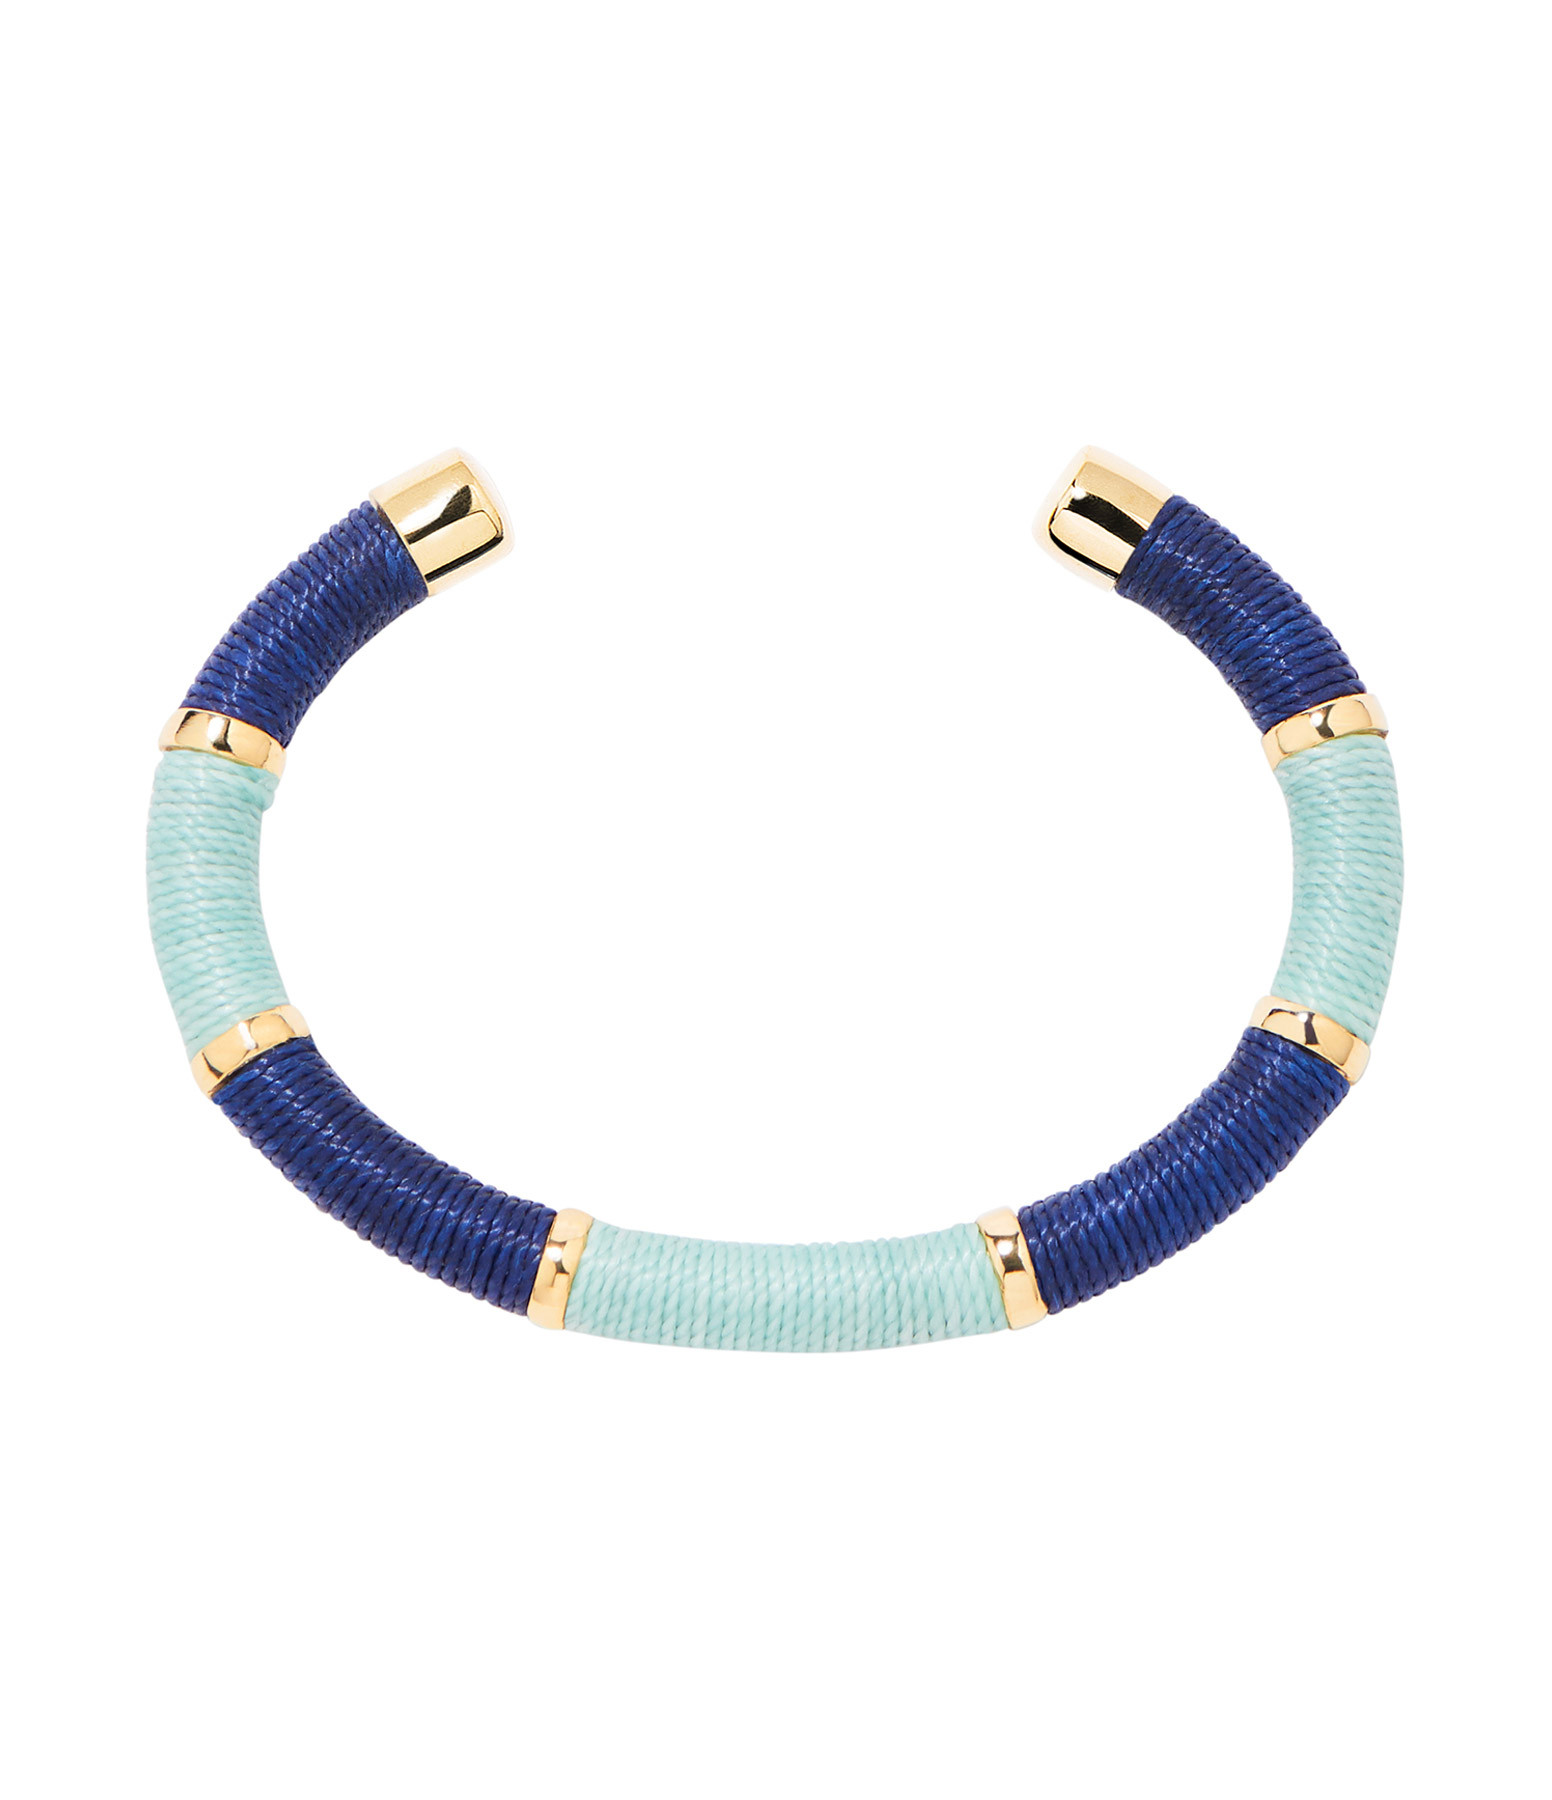 AURELIE BIDERMANN - Jonc Becky PM Fils Turquoise Bleu Plaqué Or